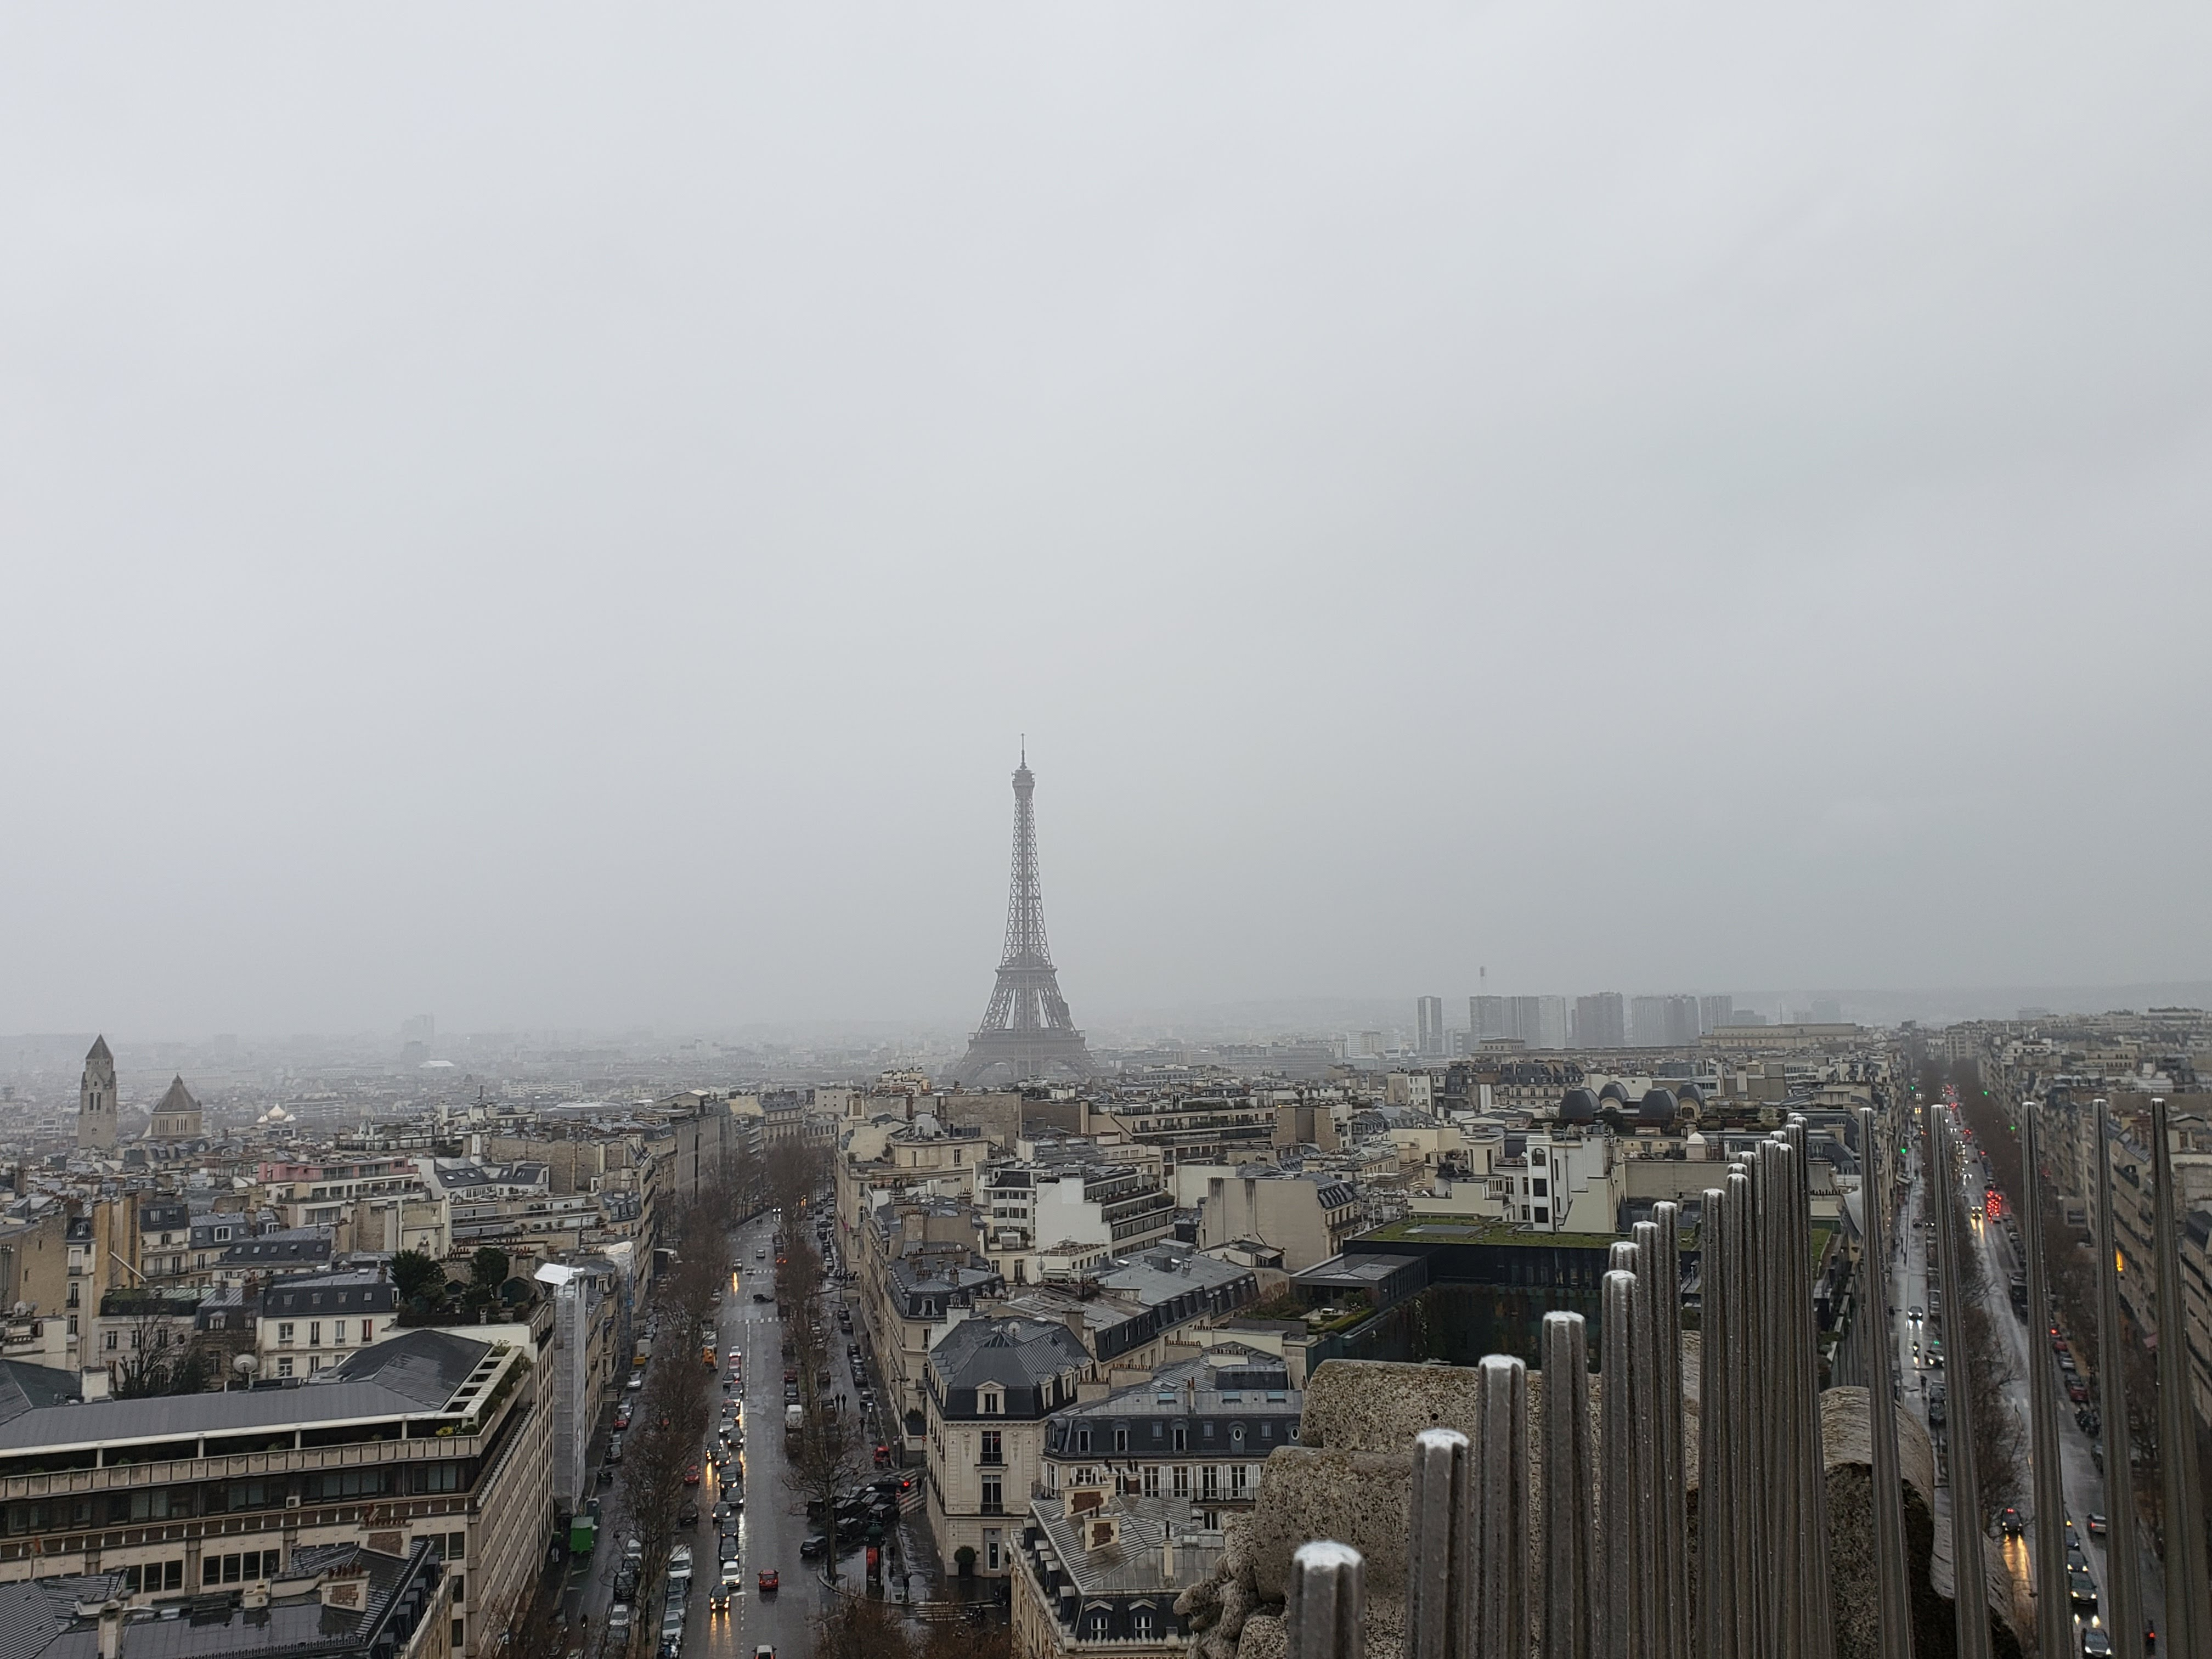 Eiffel-tower-from-arc-de-triomphe-P20-Pro